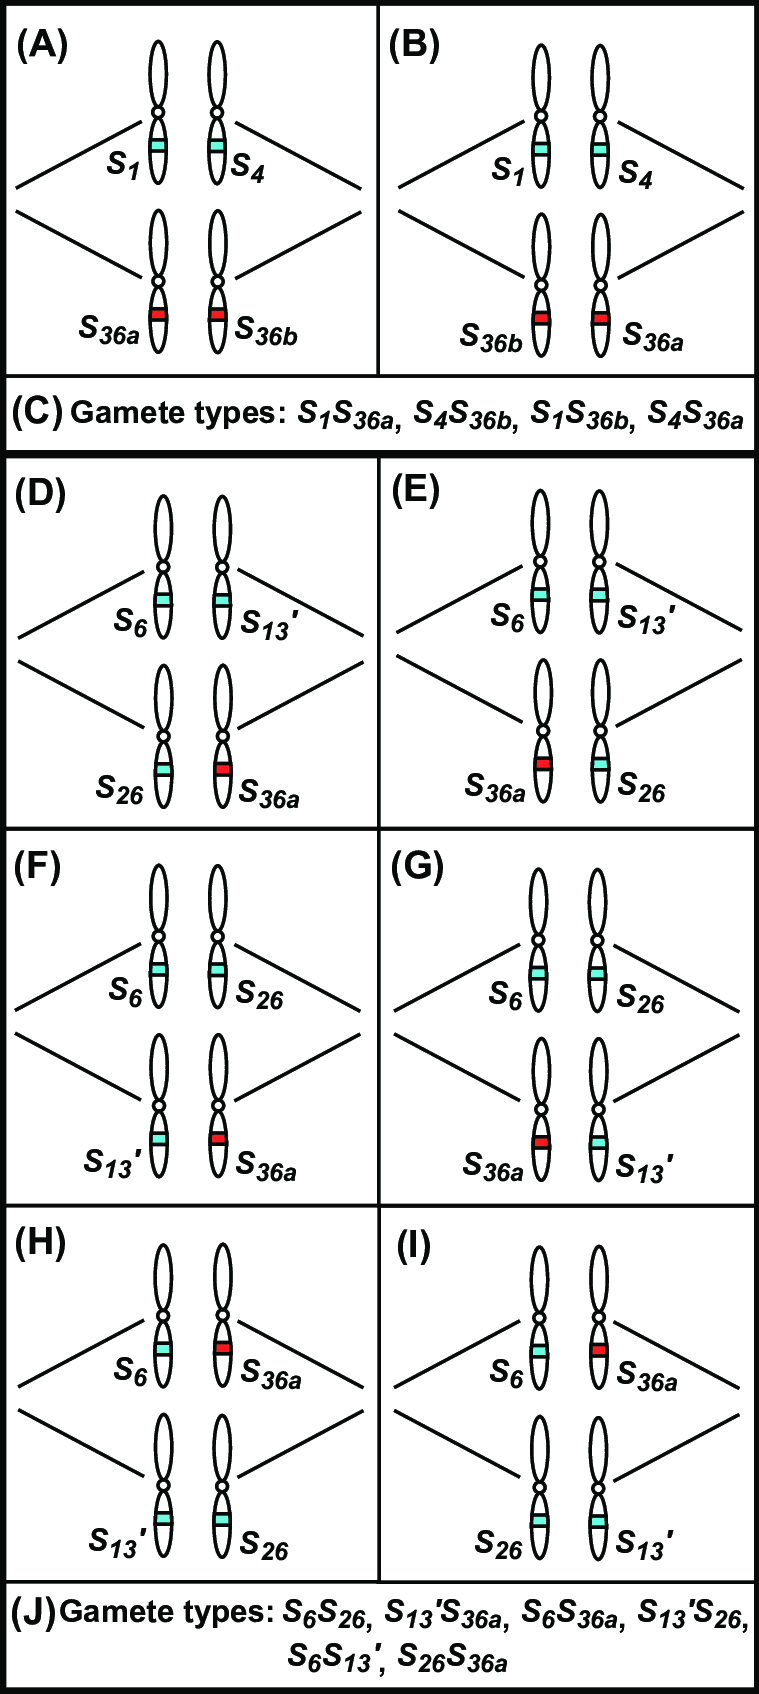 hight resolution of lg shs36 d wiring diagram detailed wiring diagram rh 7 17 3 gospelworkshop kirchzarten de whirlpool electric dryer wiring diagram lg dryer wiring diagram